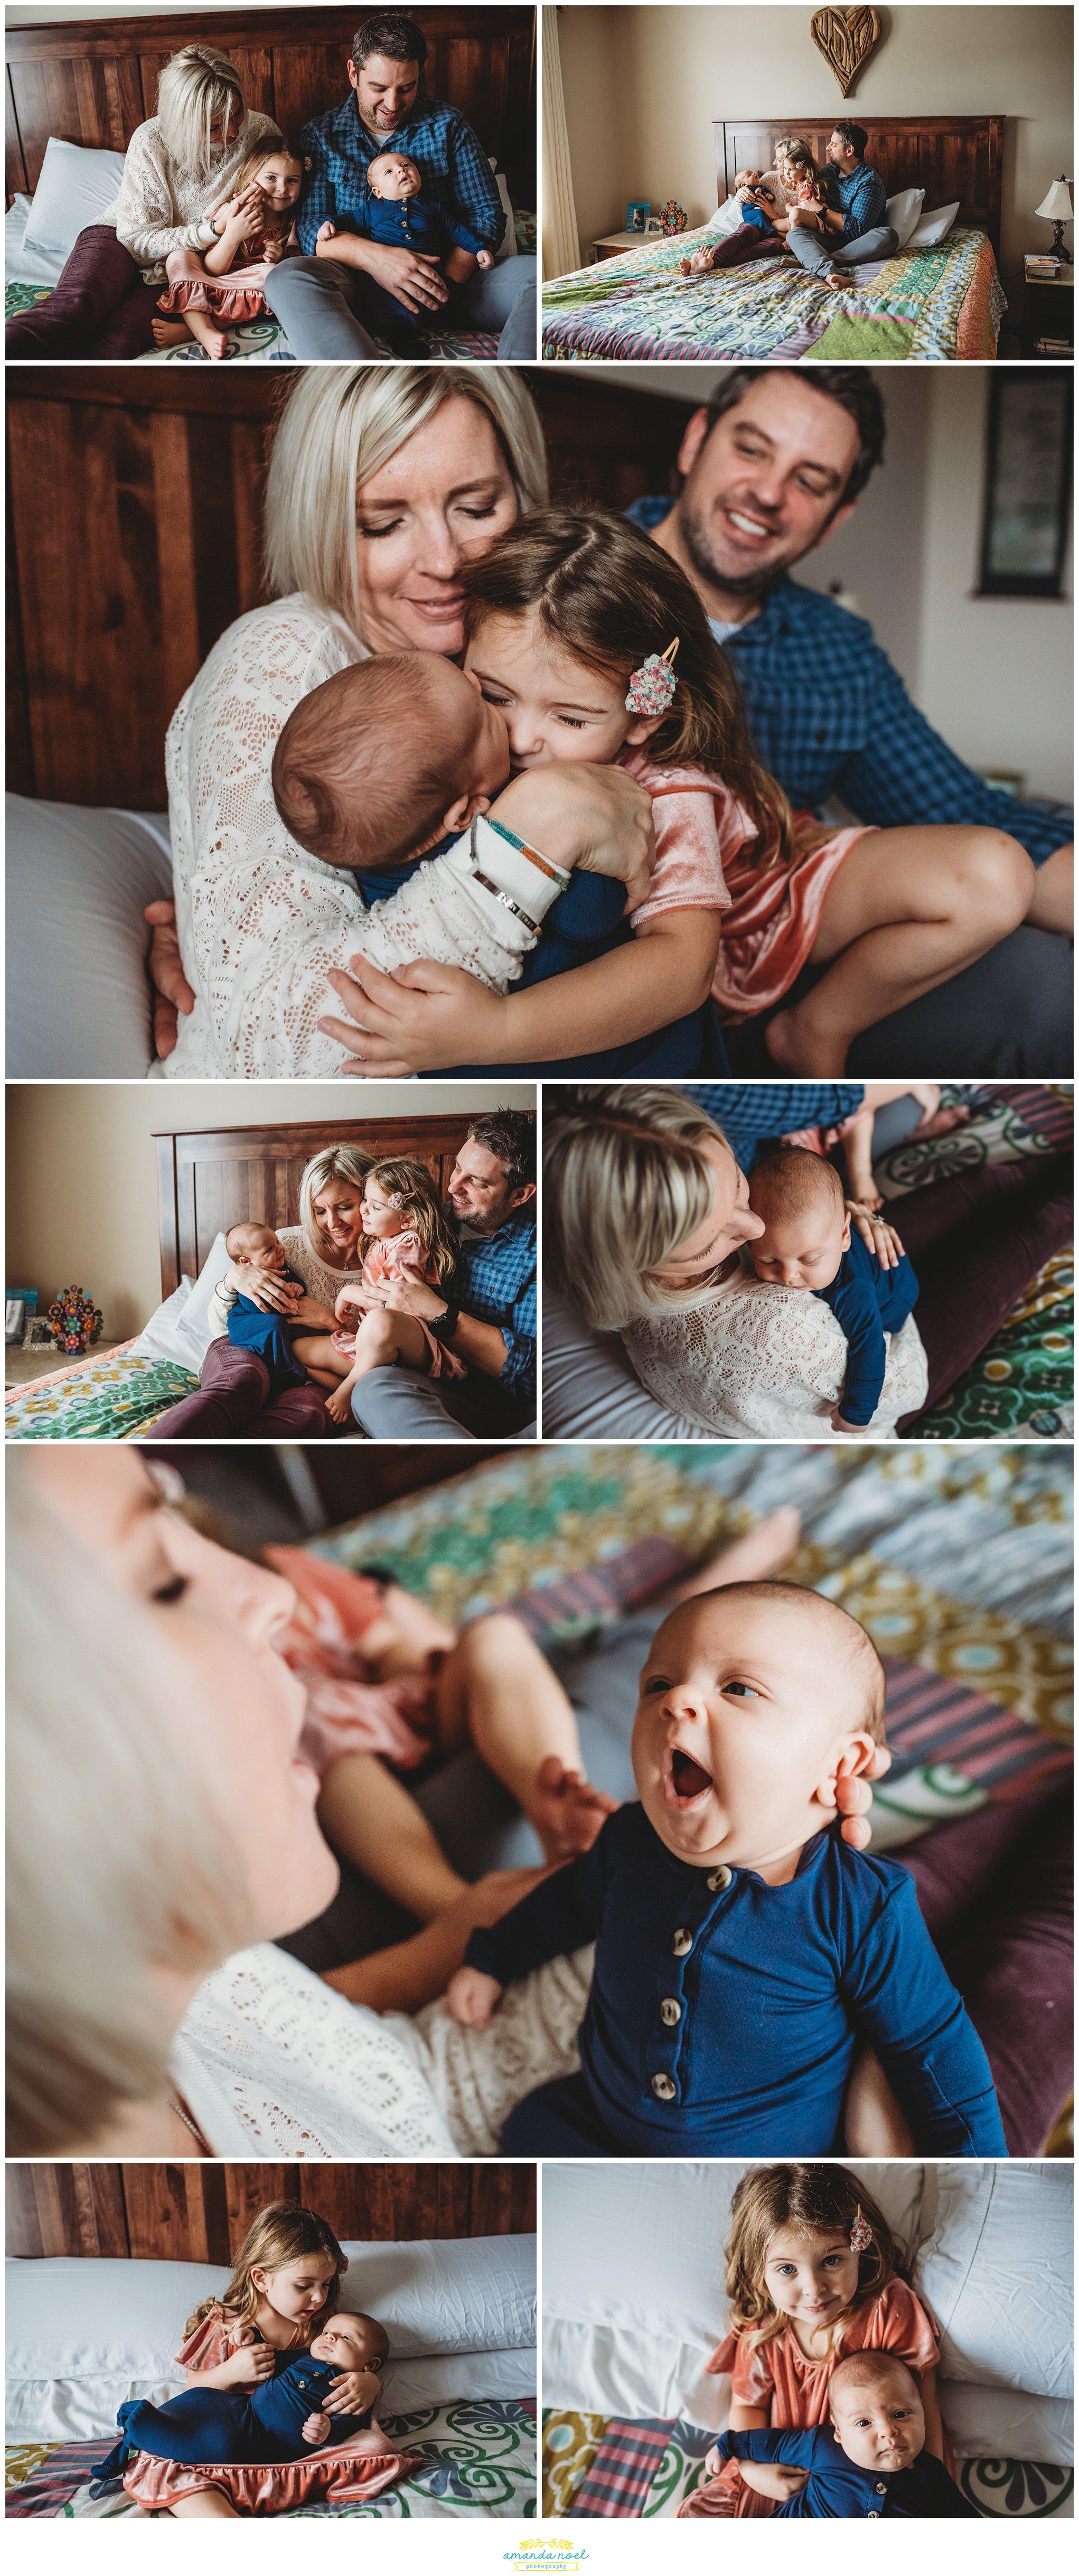 Springboro Ohio Newborn Photographer | Amanda Noel Photography | cozy in home session with big sister